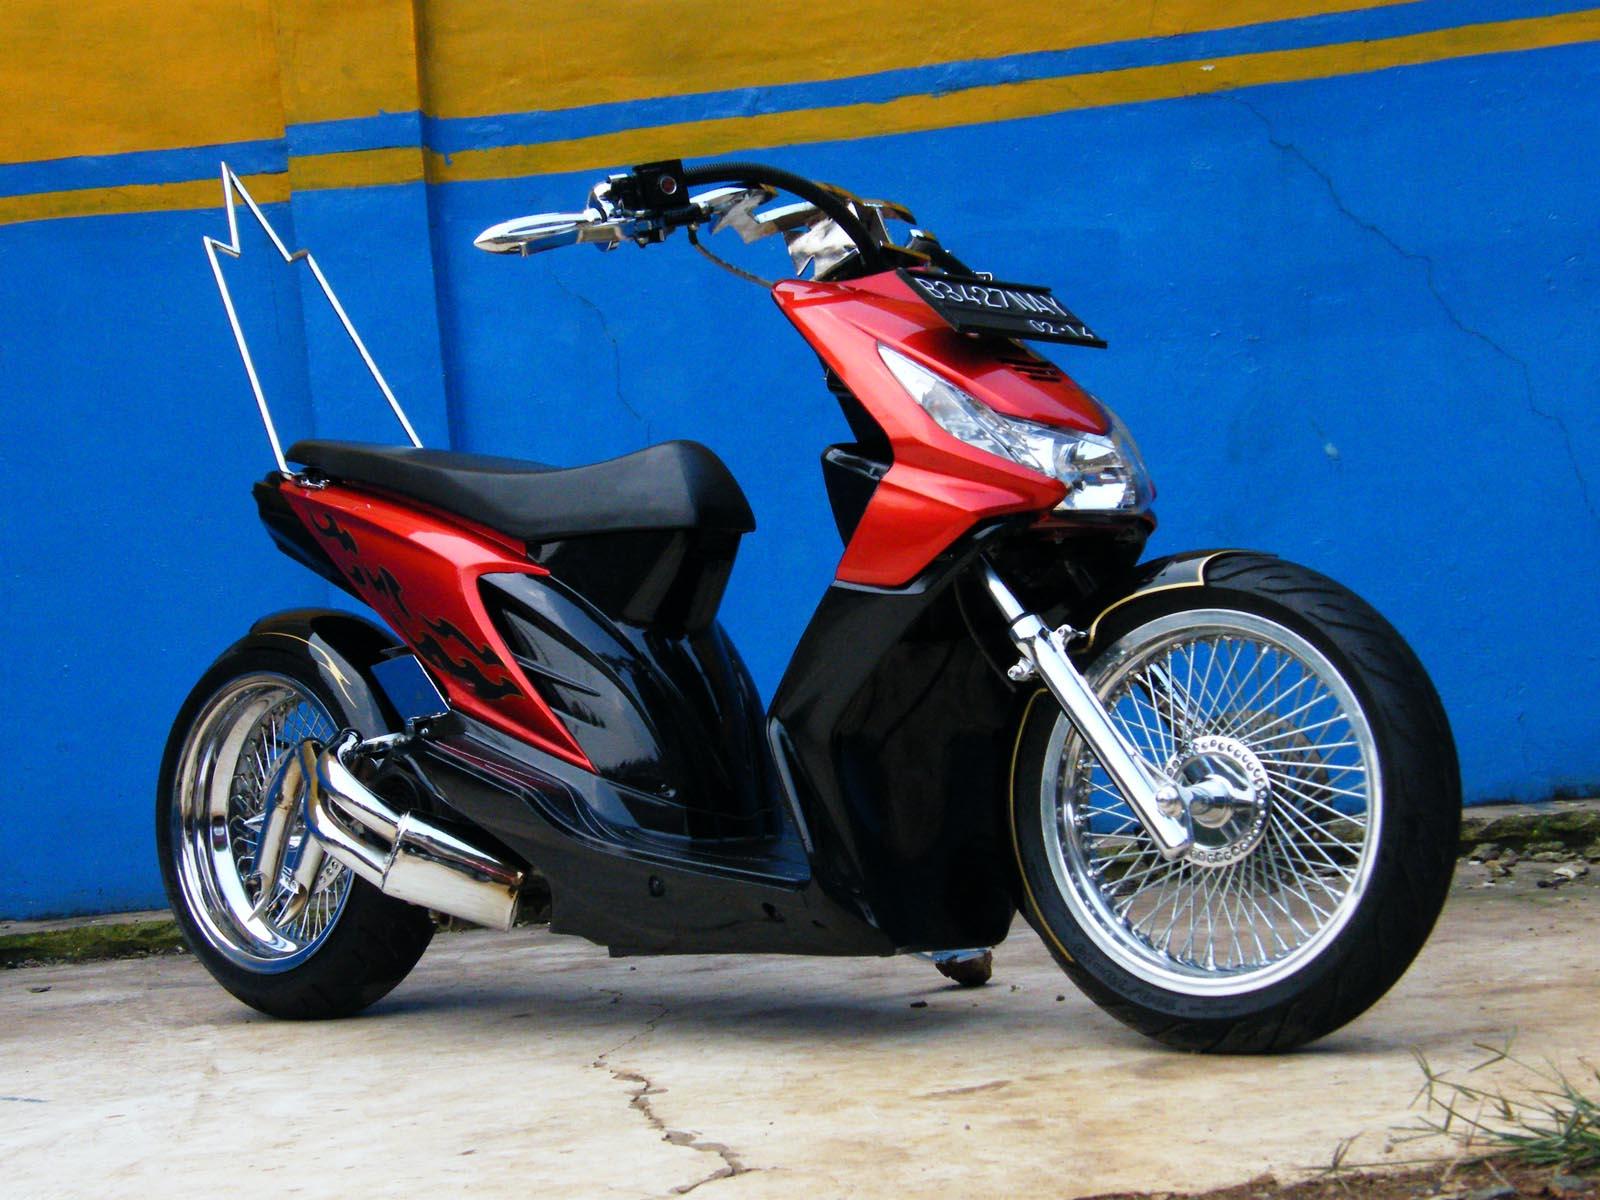 Modifikasi Mio Harley Modif Motor Terbaru 2019